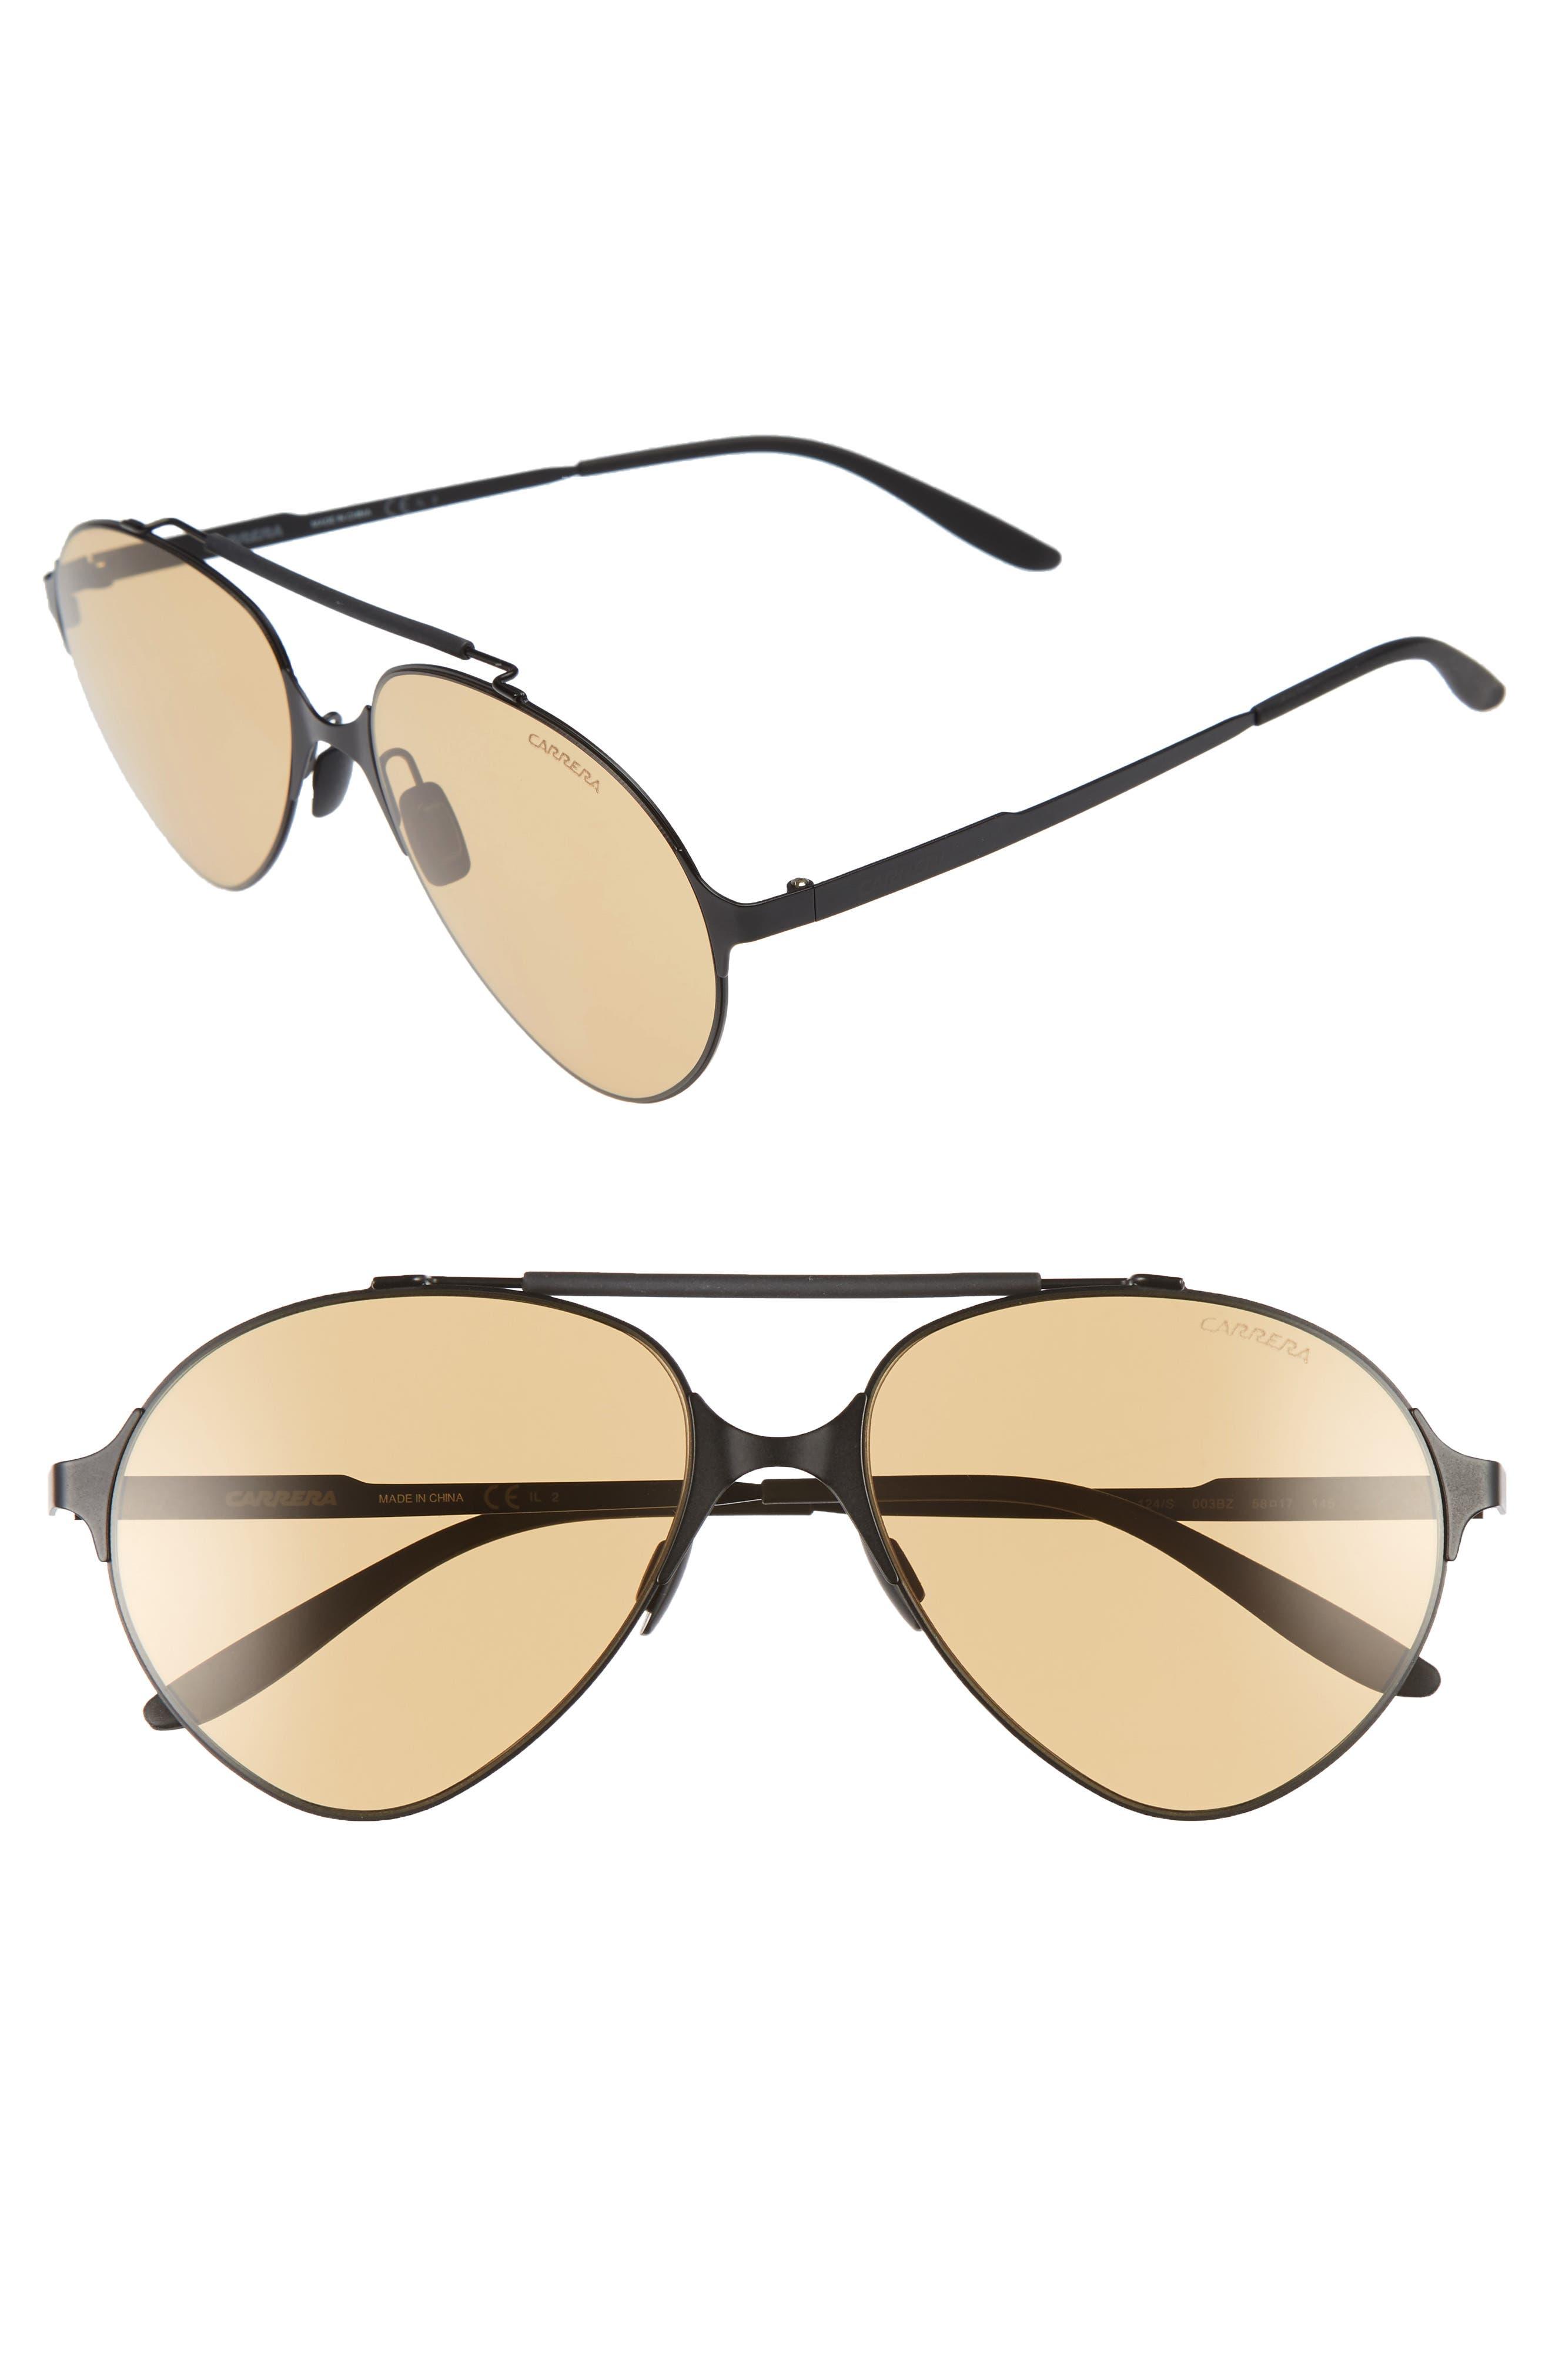 Carrera 58mm Gradient Pilot Sunglasses,                         Main,                         color, 001